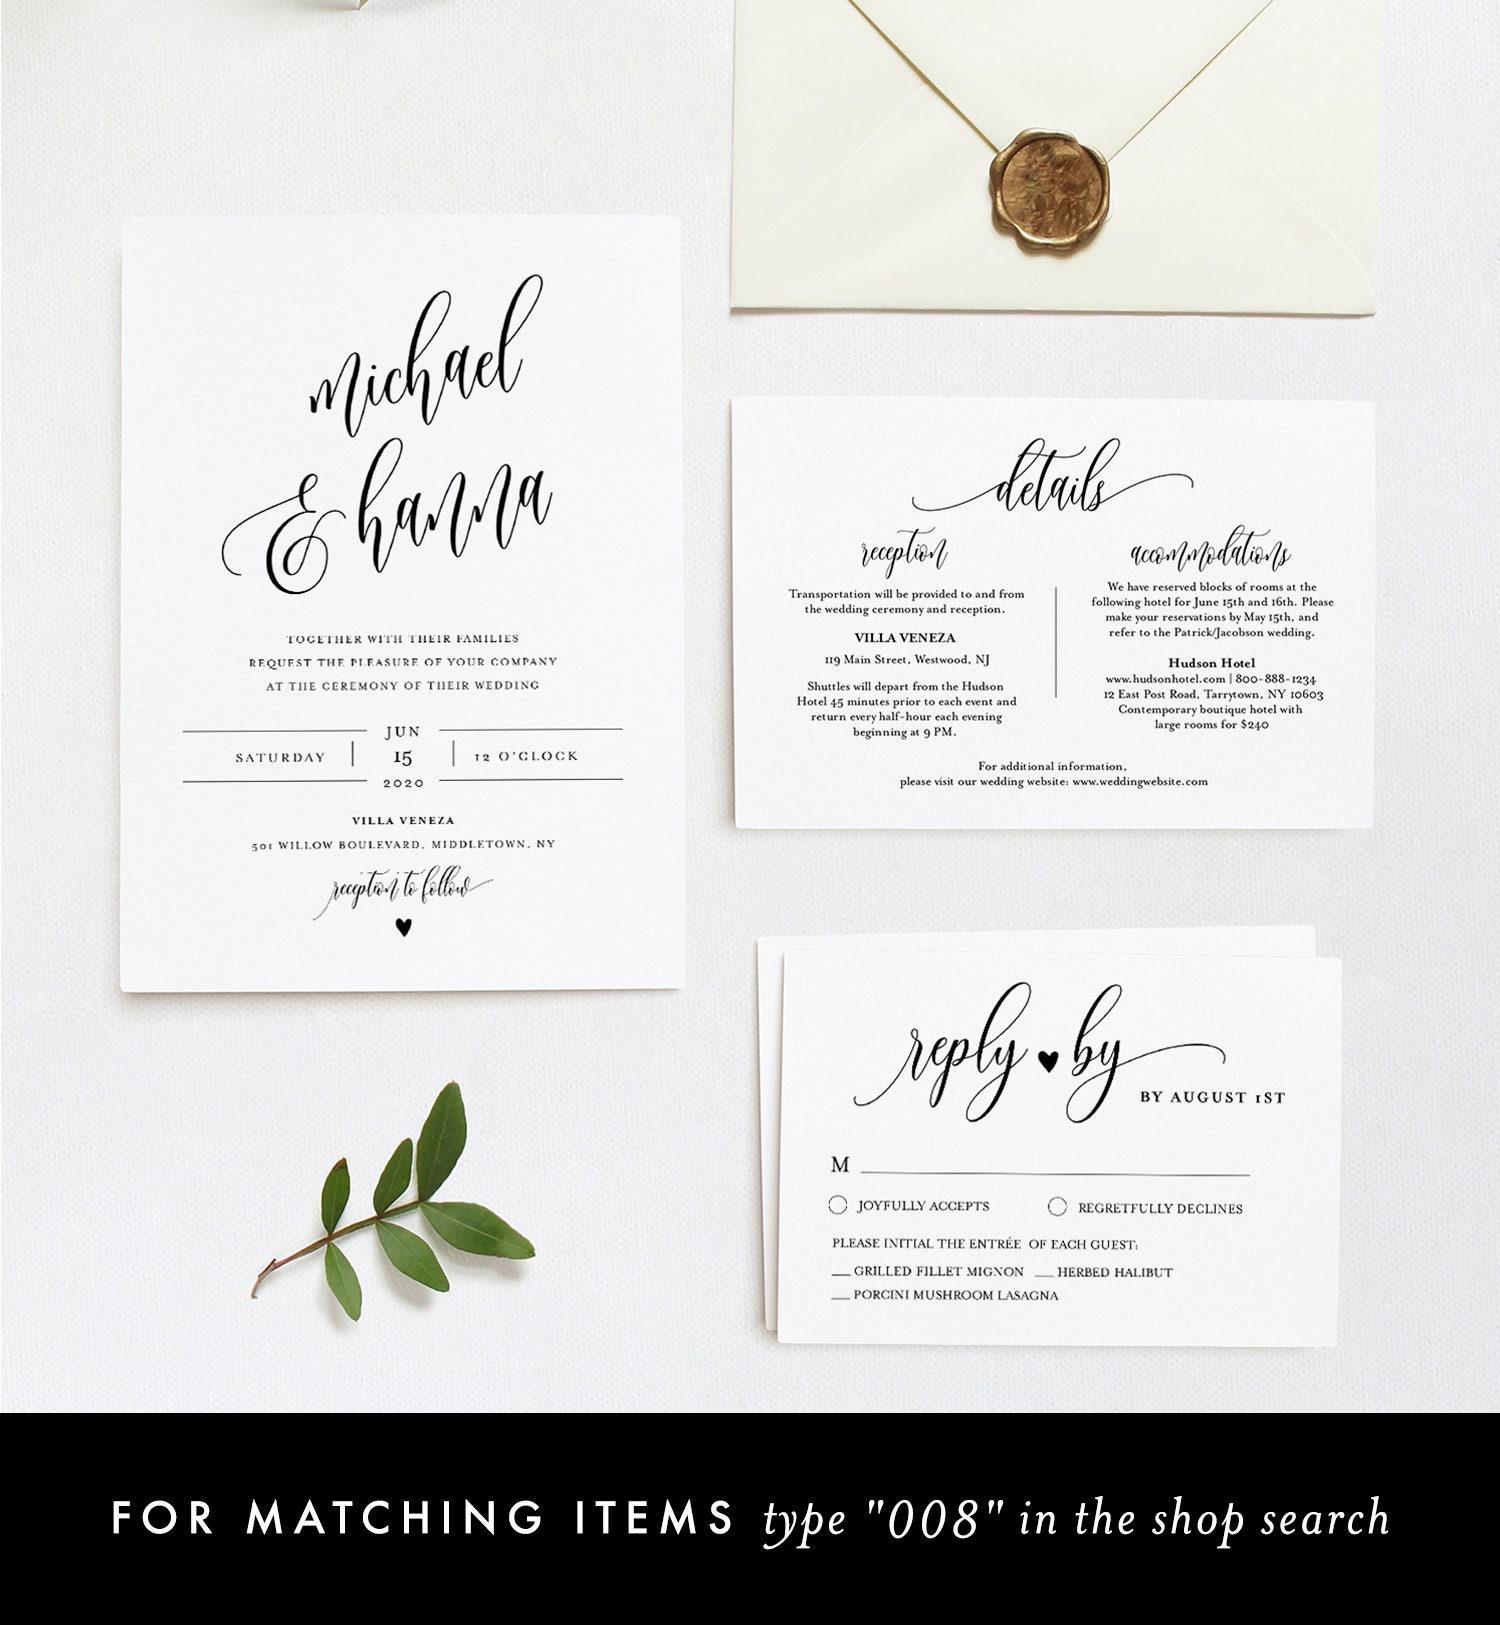 Unlimited Custom Table Sign Template Modern Wedding Decor DIY 5x7 and 8x10 Minimalist Wedding Sign Printable Editable in TEMPLETT